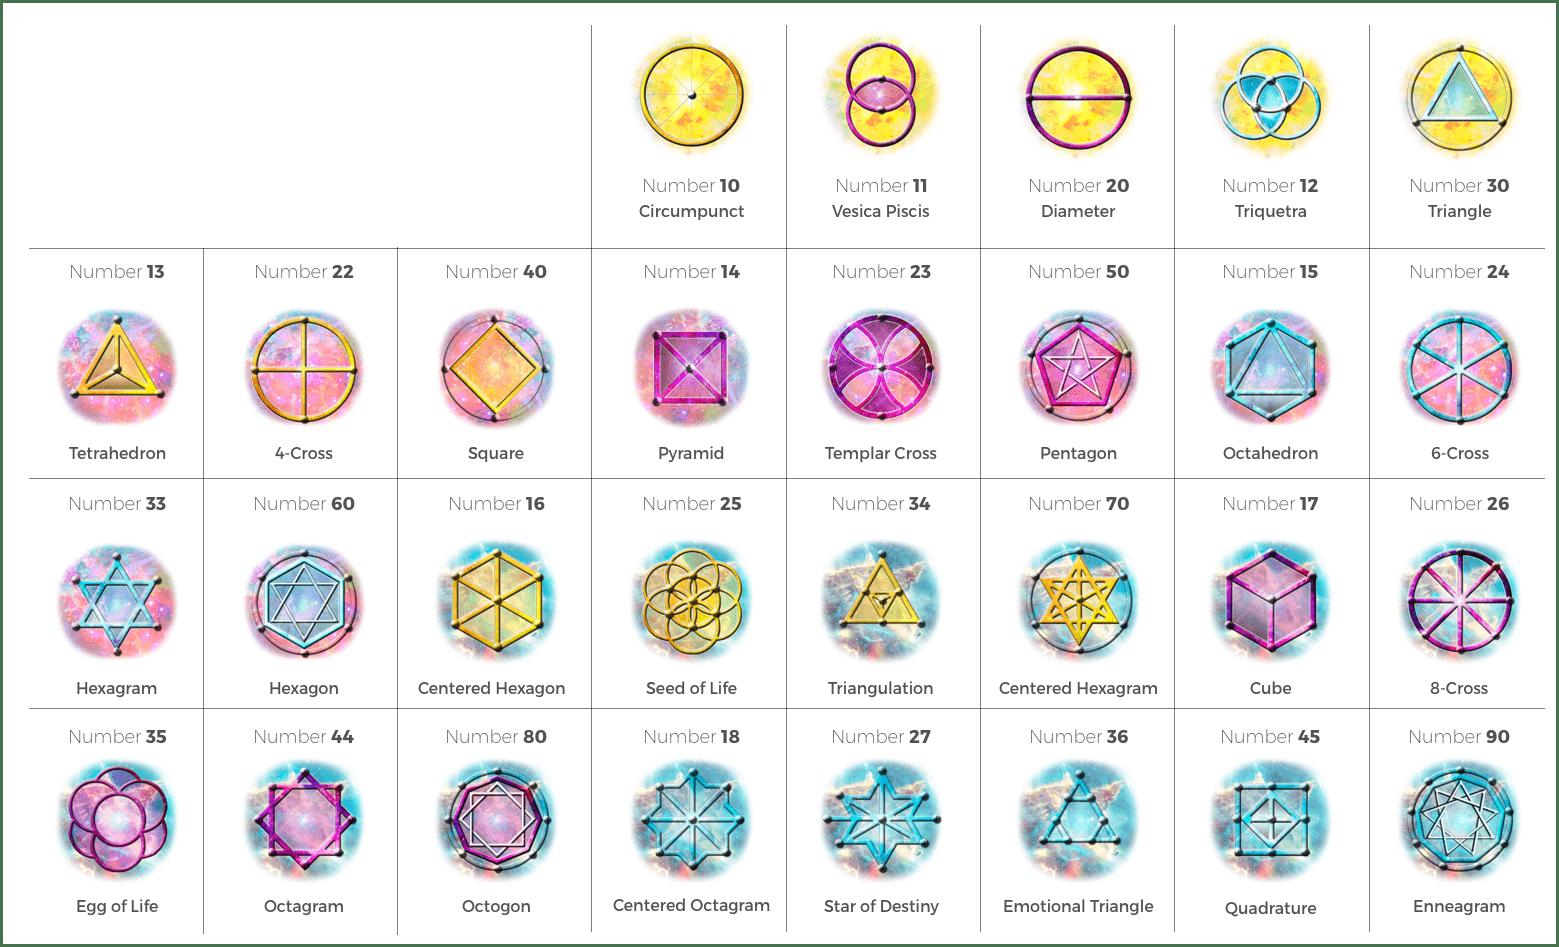 the 29-symbols of geonumerology